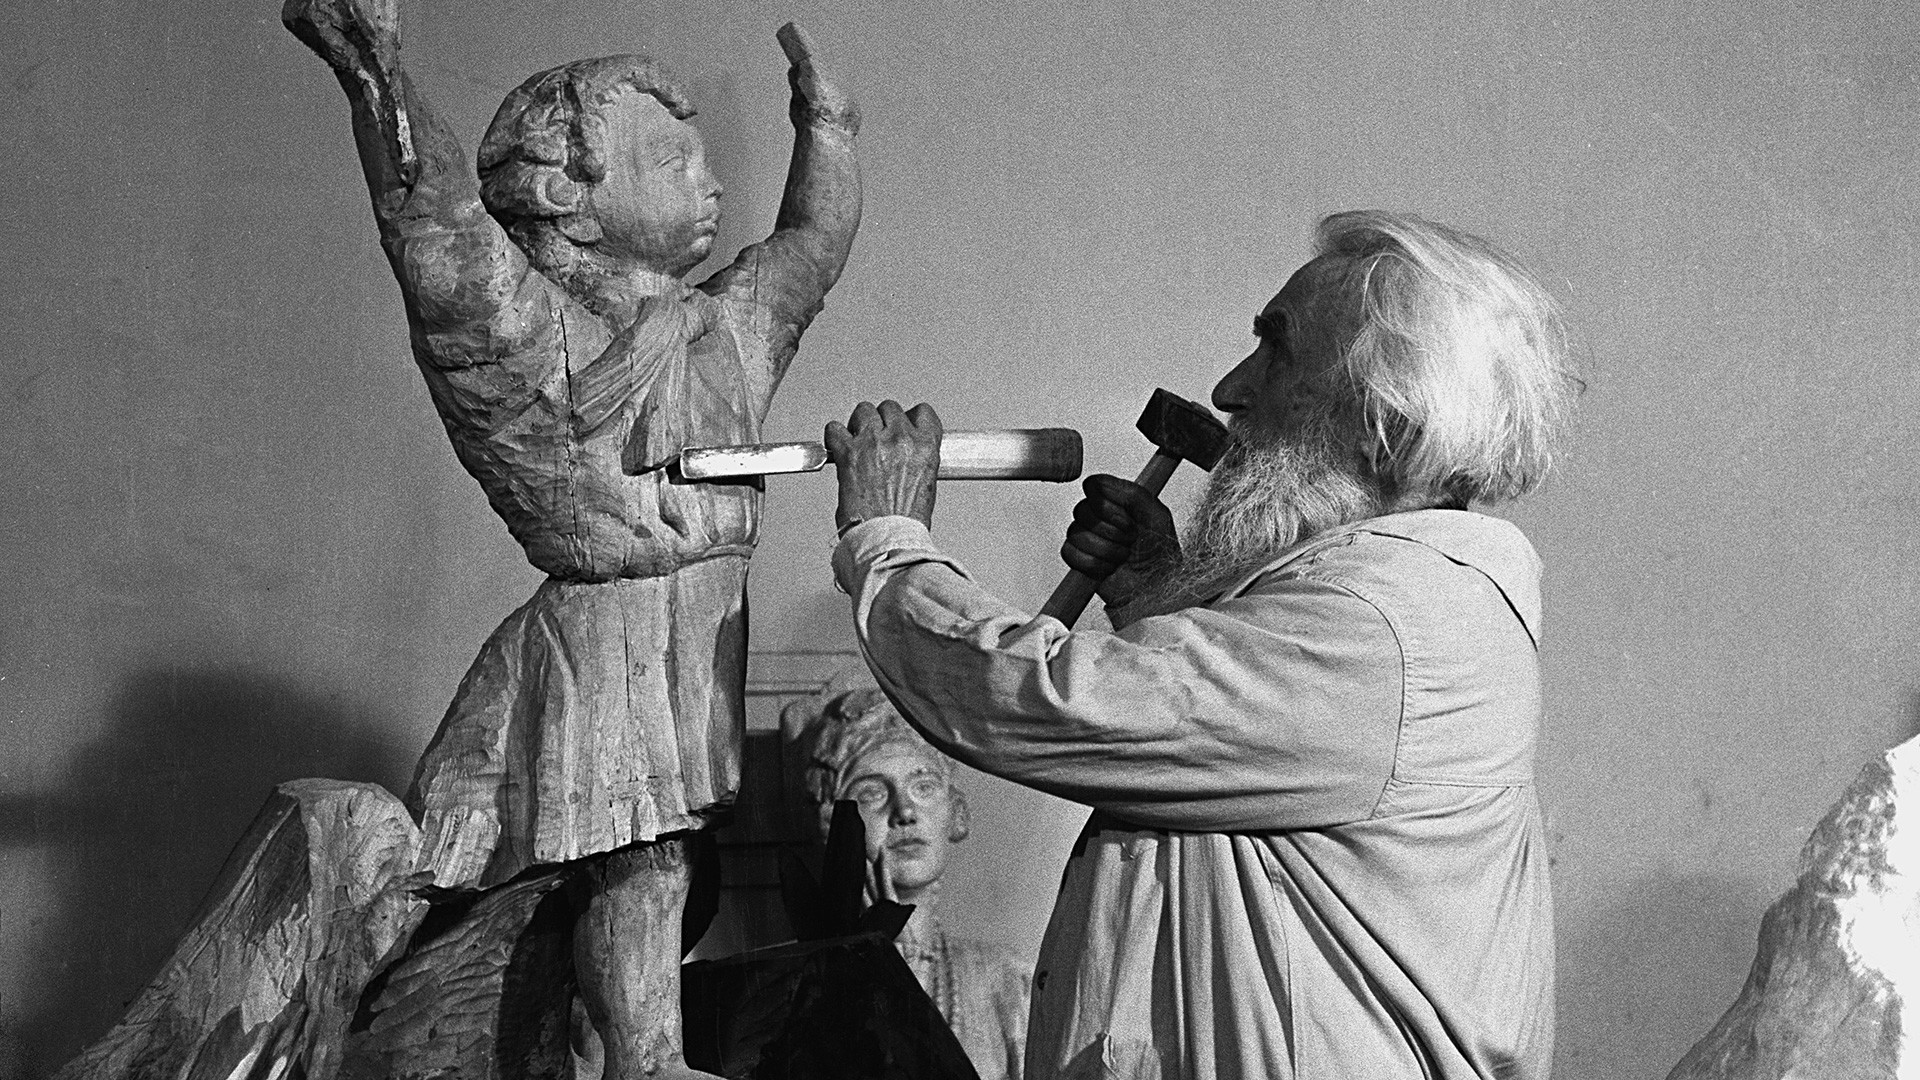 Pavel Egorov - biography and creativity